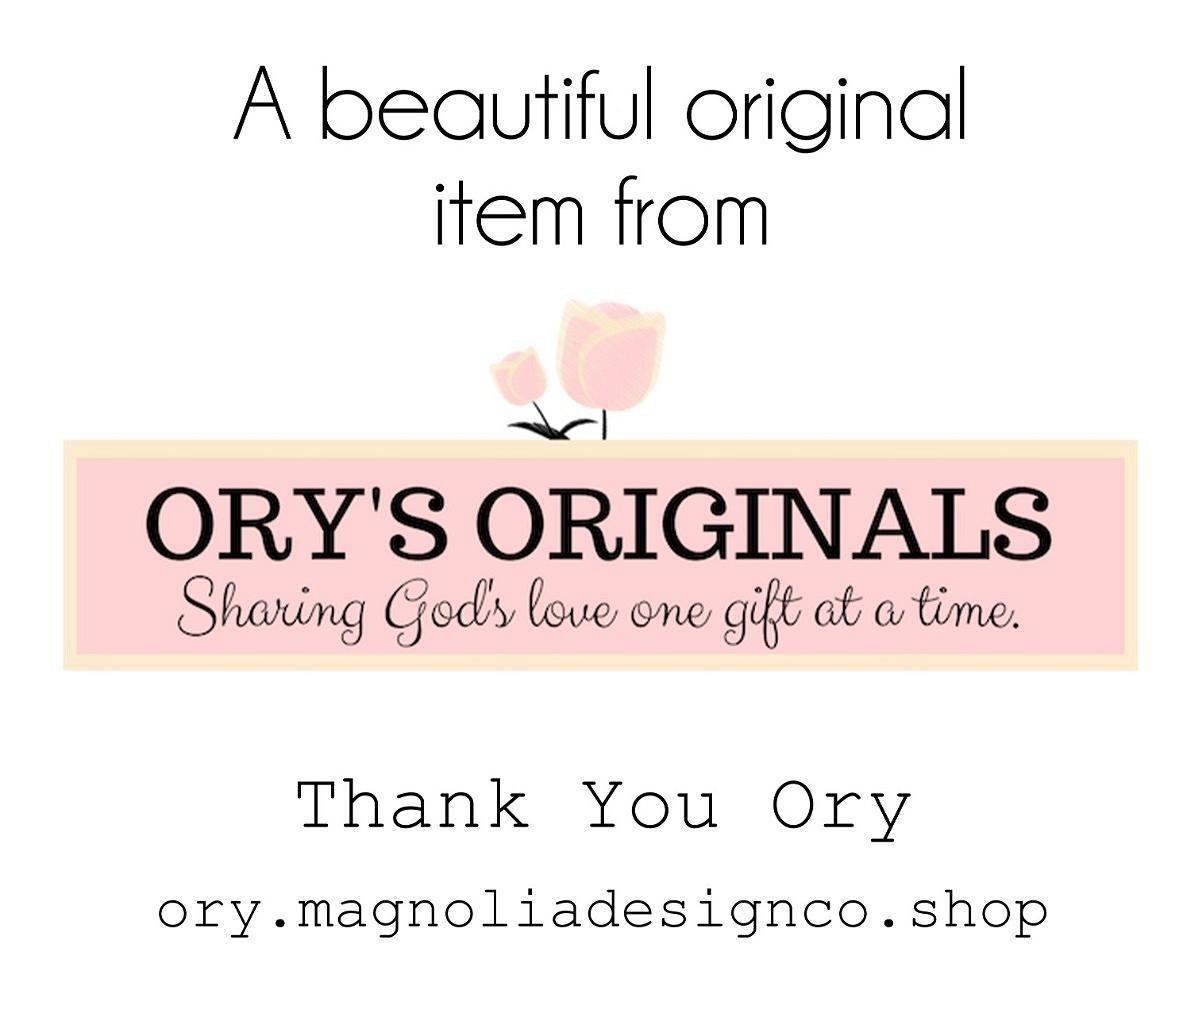 Ory's Originals